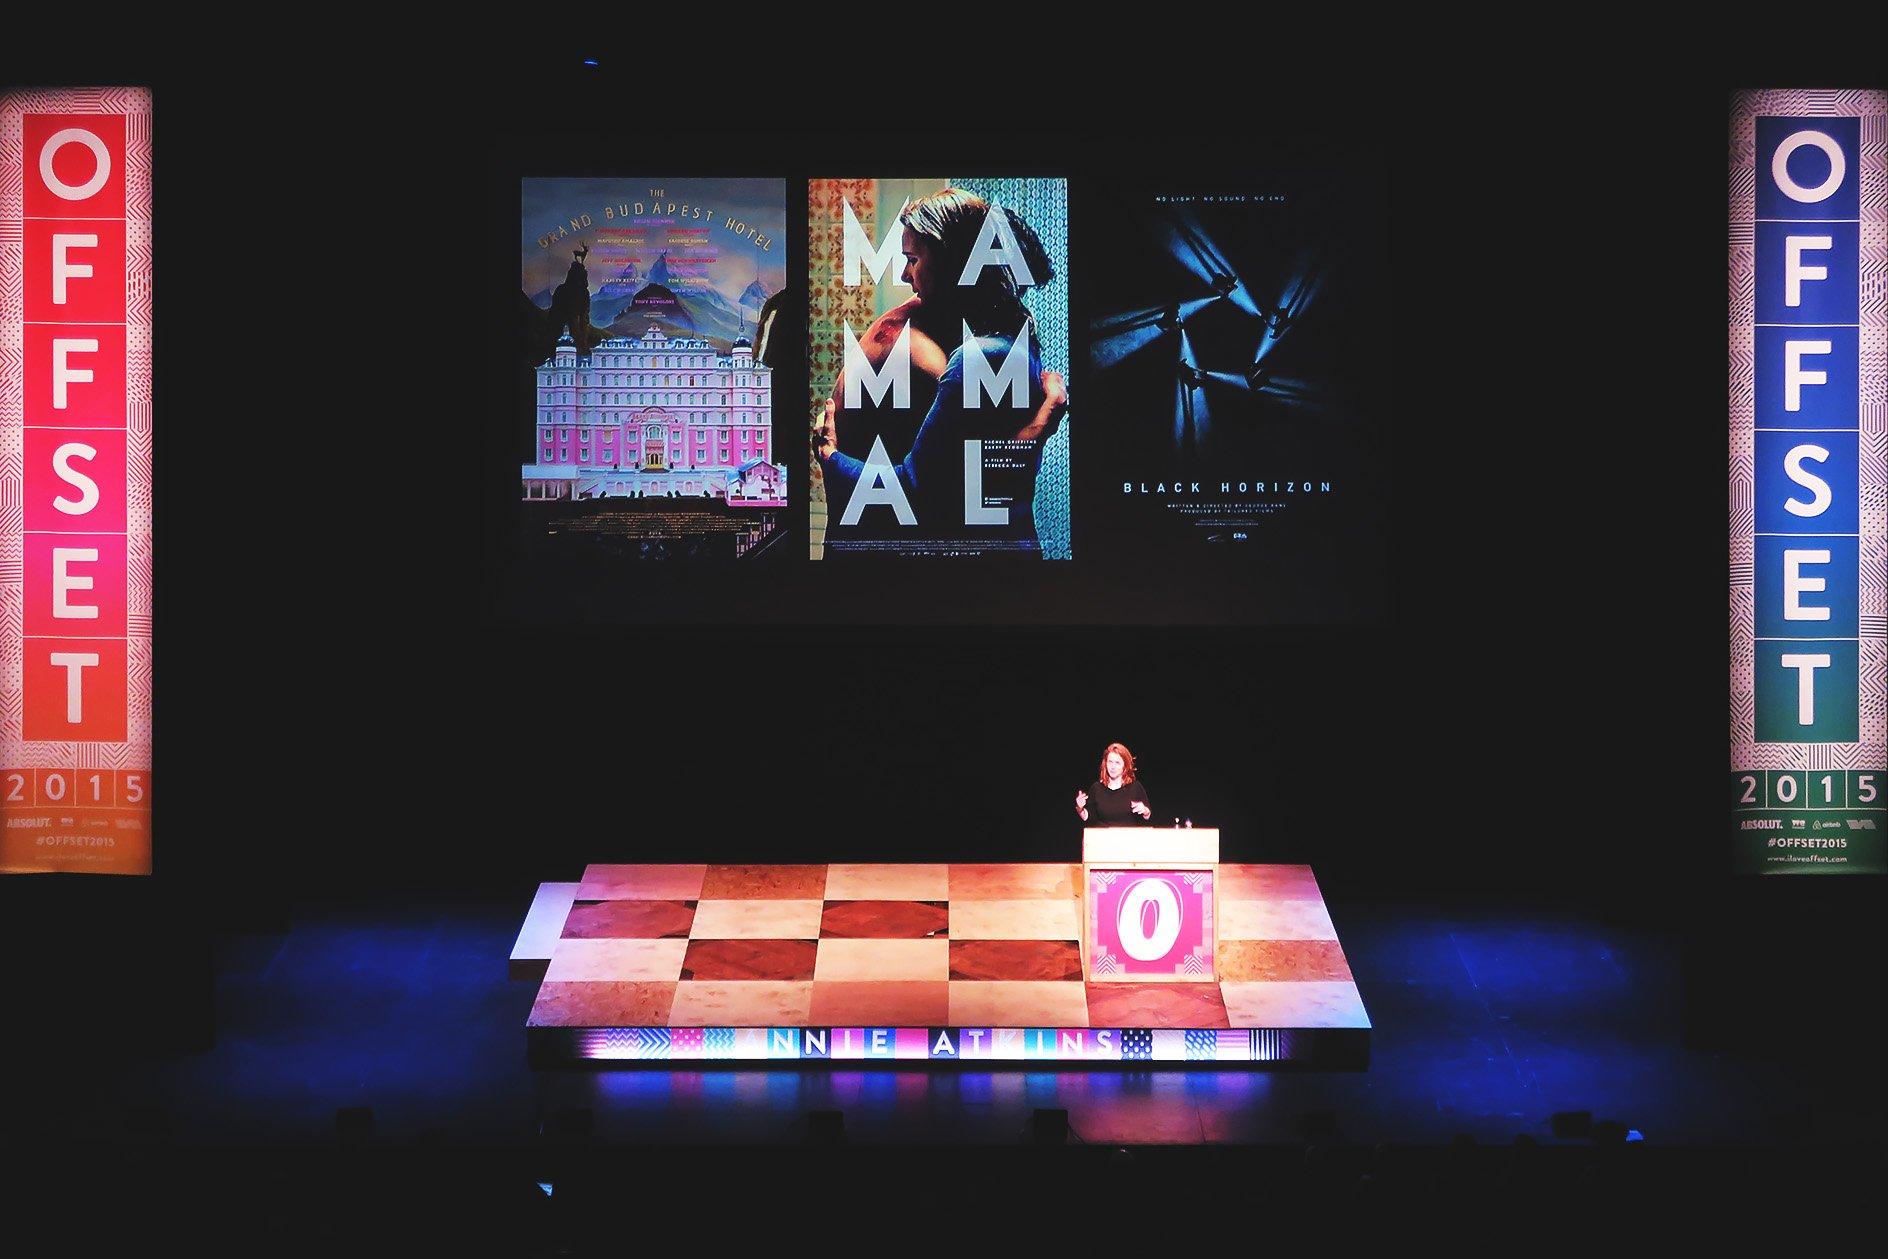 Annie Atkins at OFFSET 2015 – Work Samples